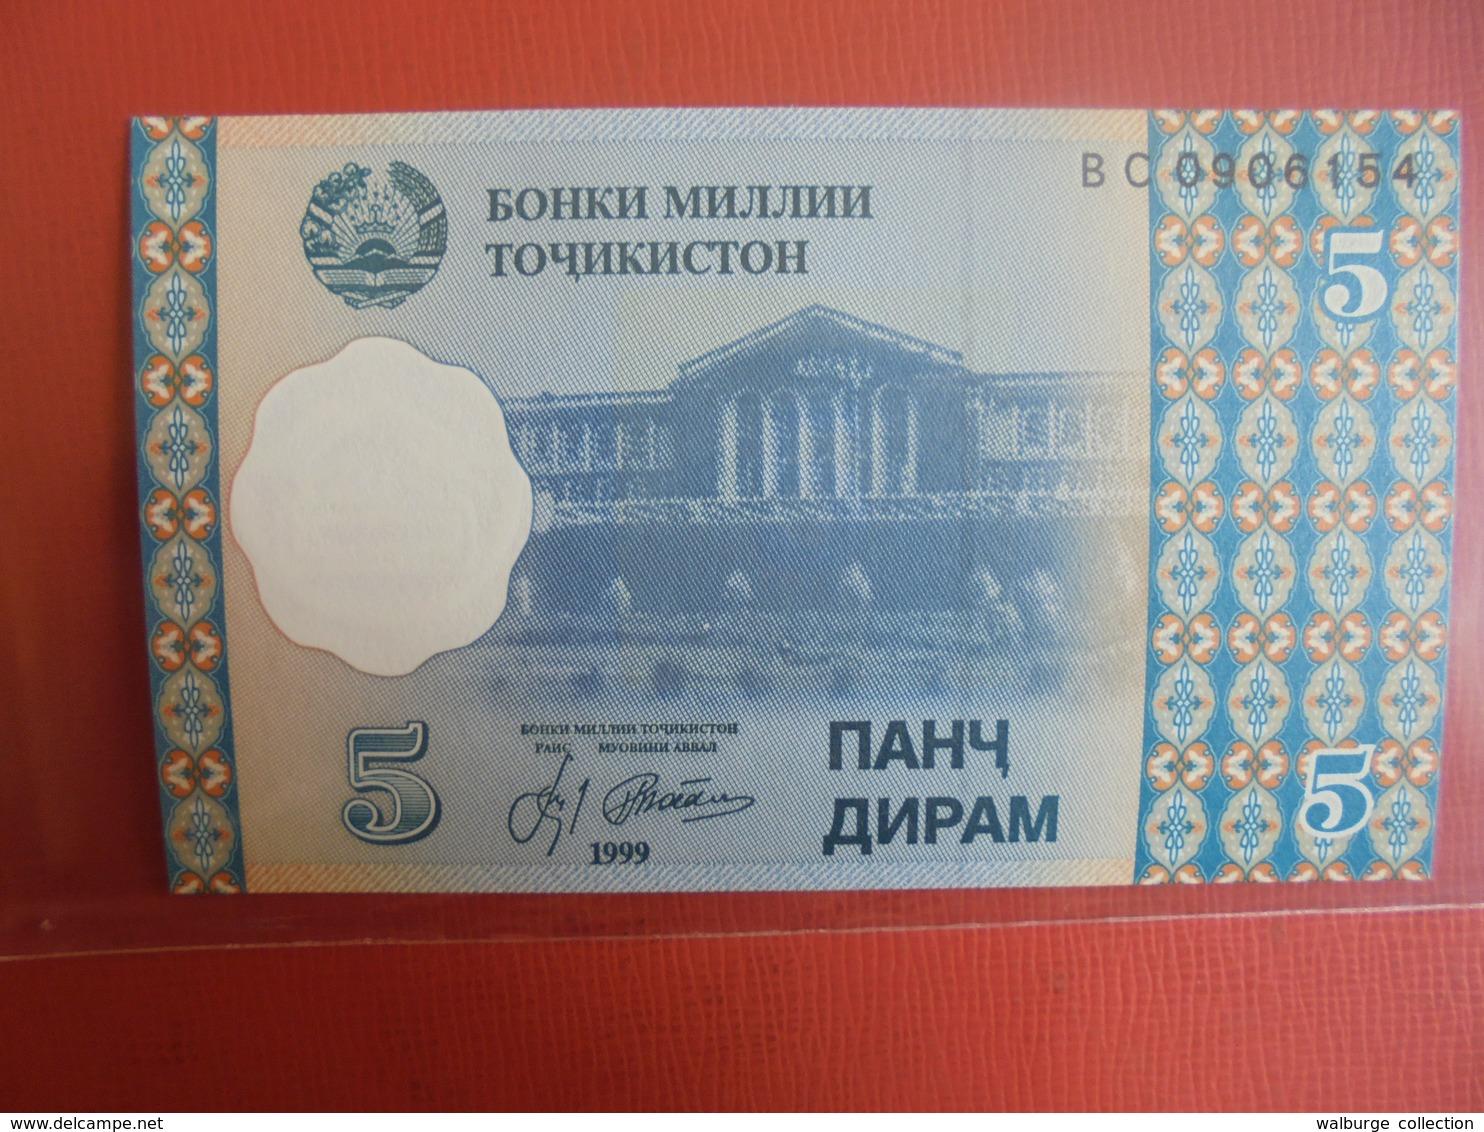 TADJIKISTAN 5 DIRAMS 1999 PEU CIRCULER/NEUF - Tajikistan